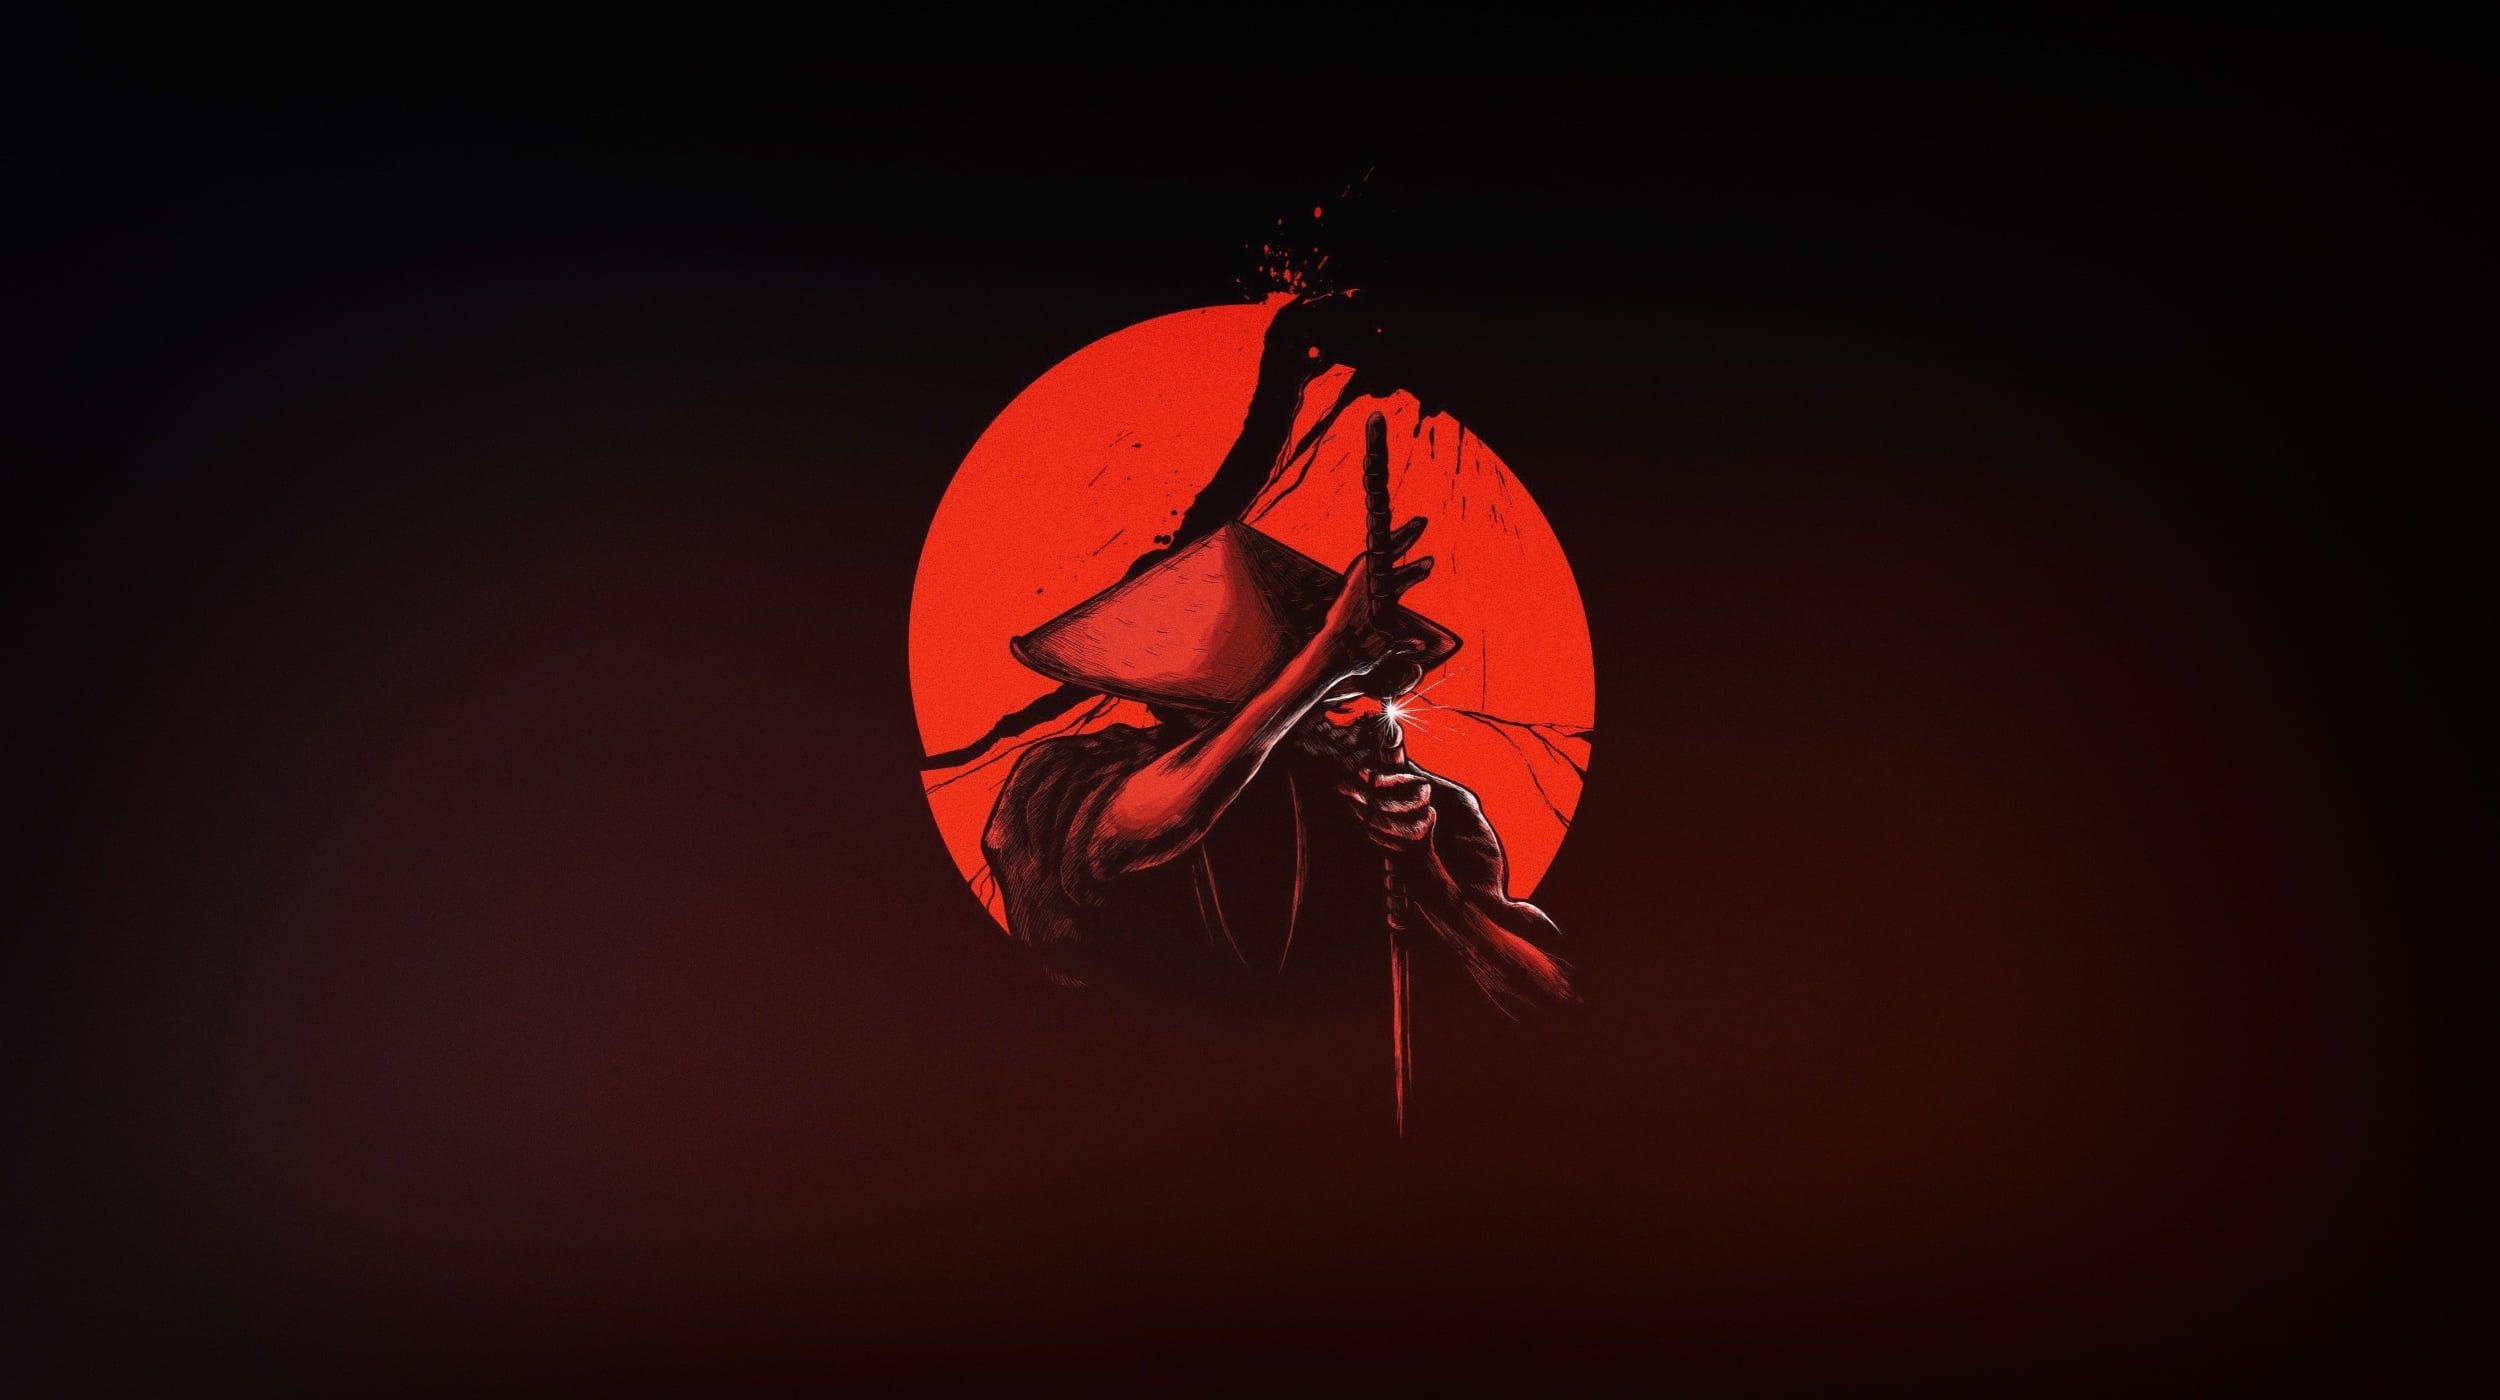 The Sun Minimalism Japan Sword Warrior Samurai Art Katana 1080p Wallpaper Hdwallpaper Desktop In 2021 Samurai Wallpaper Samurai Art Japanese Art